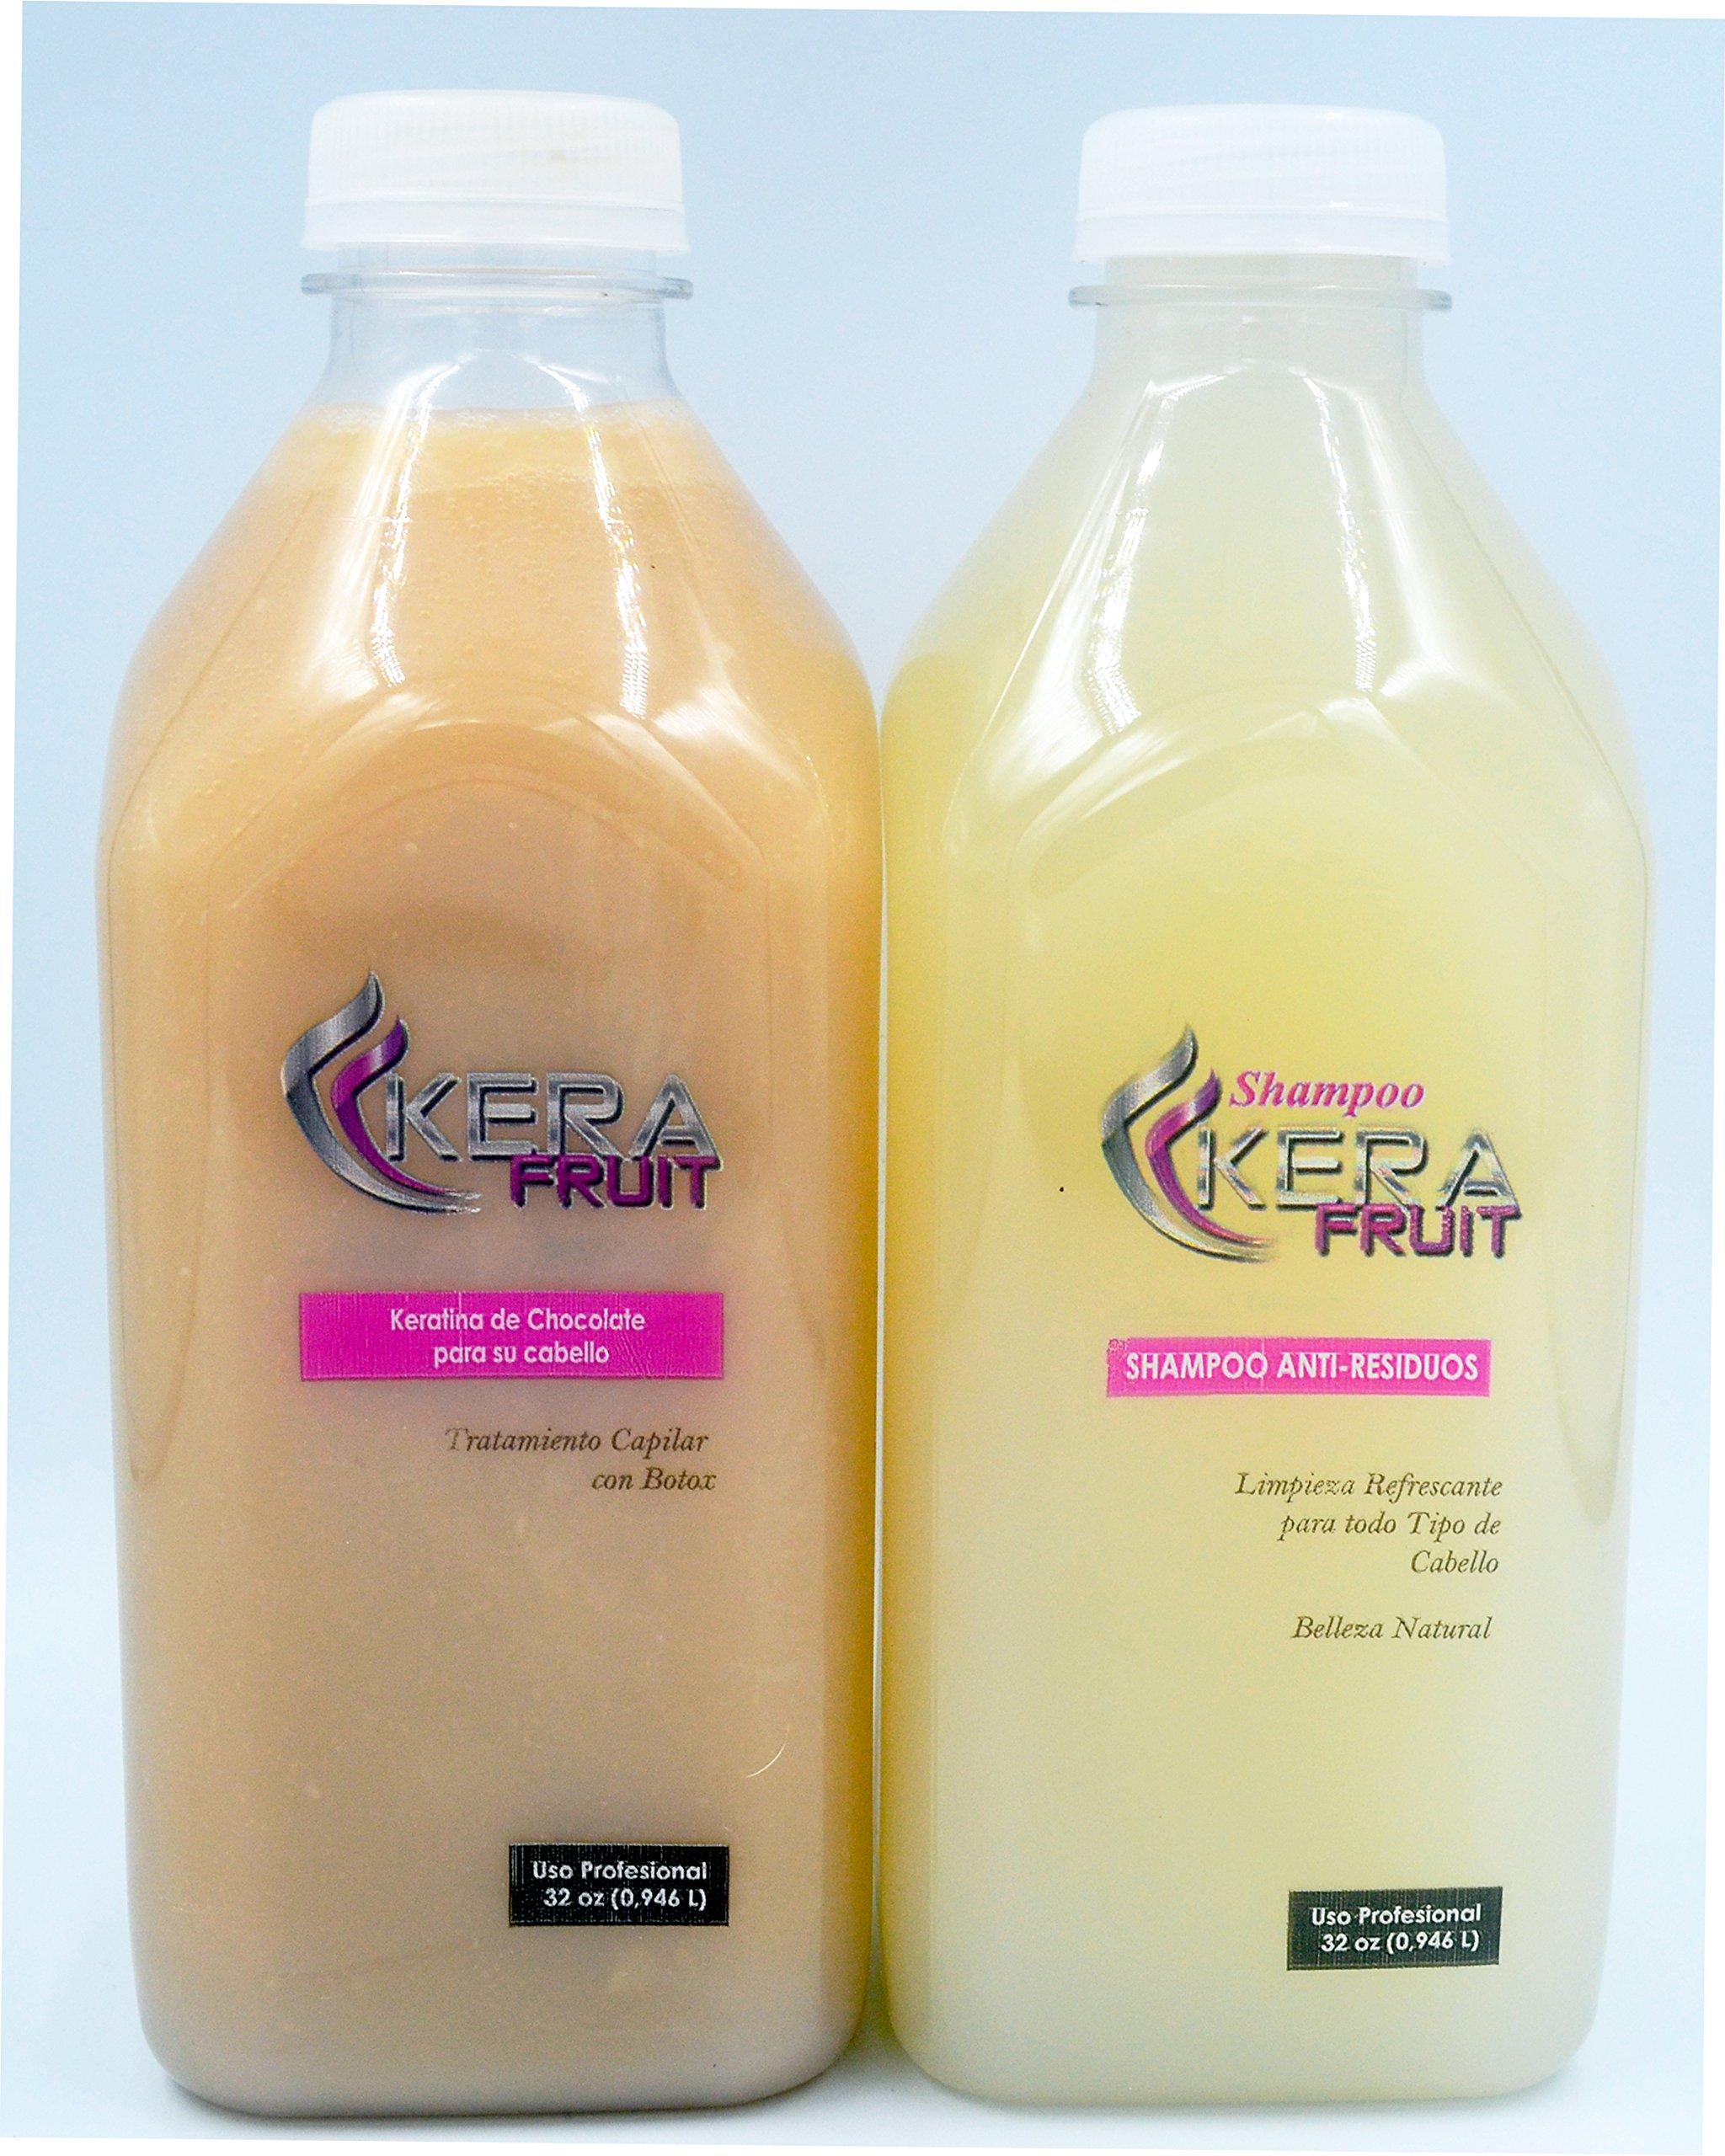 Complex Brazilian Keratin Hair Treatment Professional Combo (Treatment + Shampoo) 32 oz or 1000 ml Elimina el Frizz Formula Original